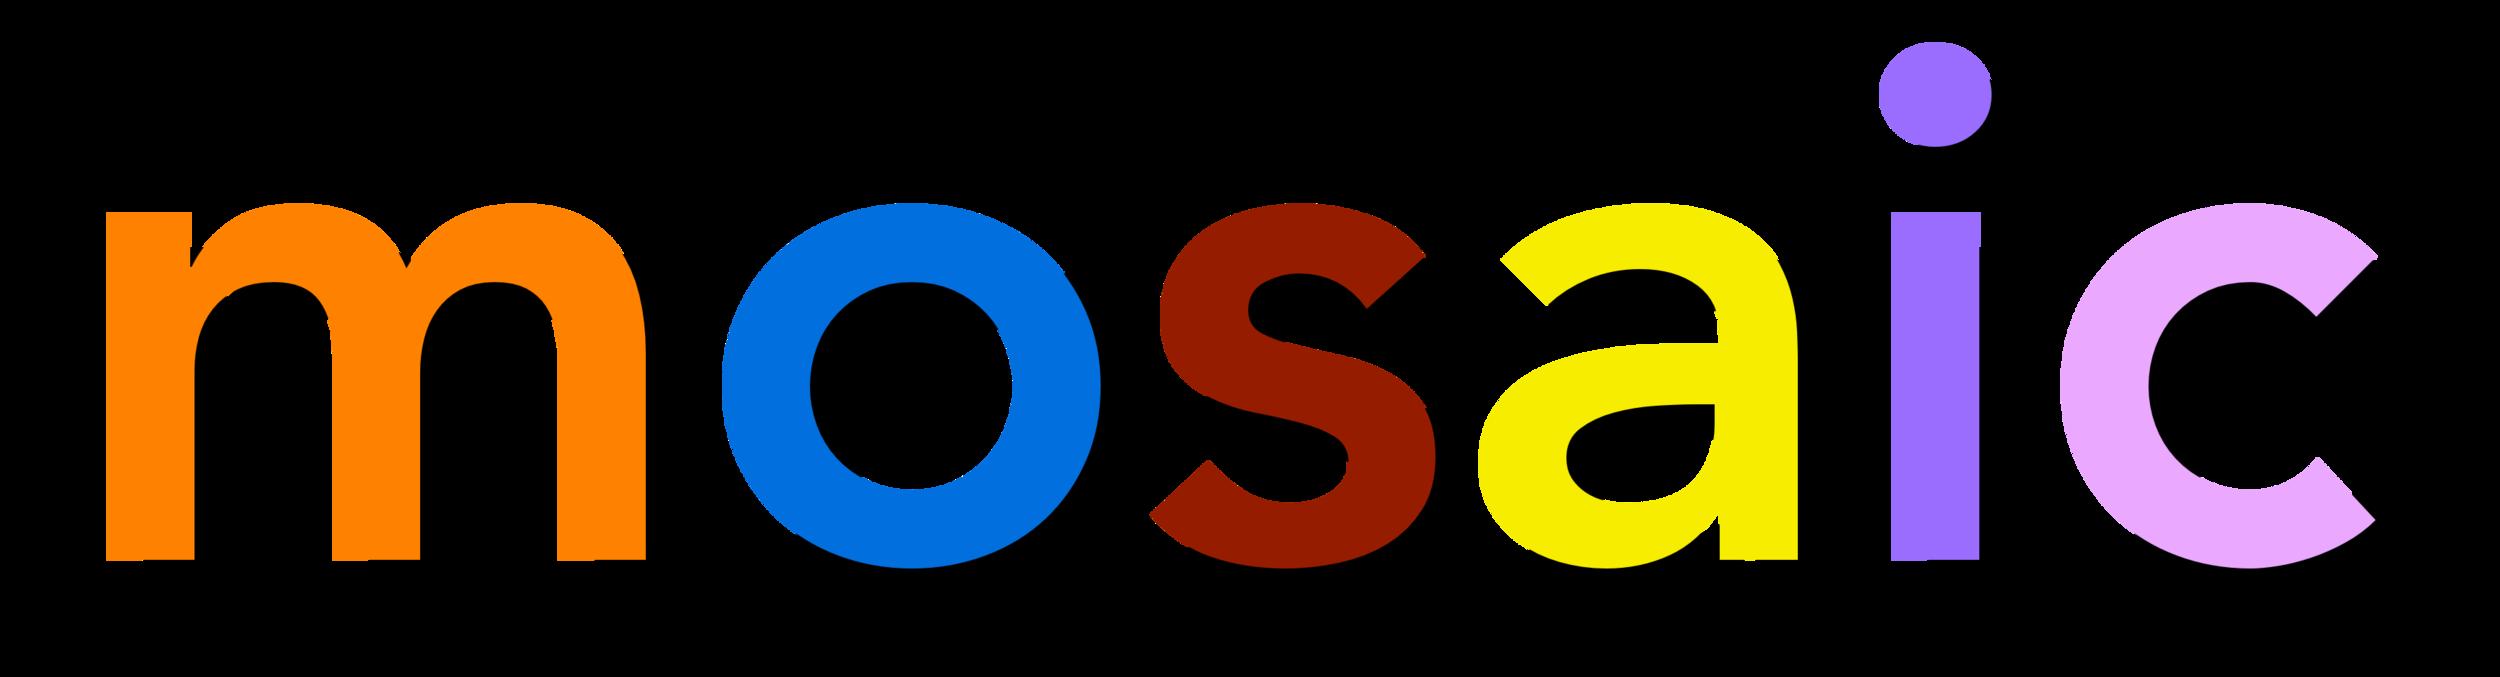 site top logo.png